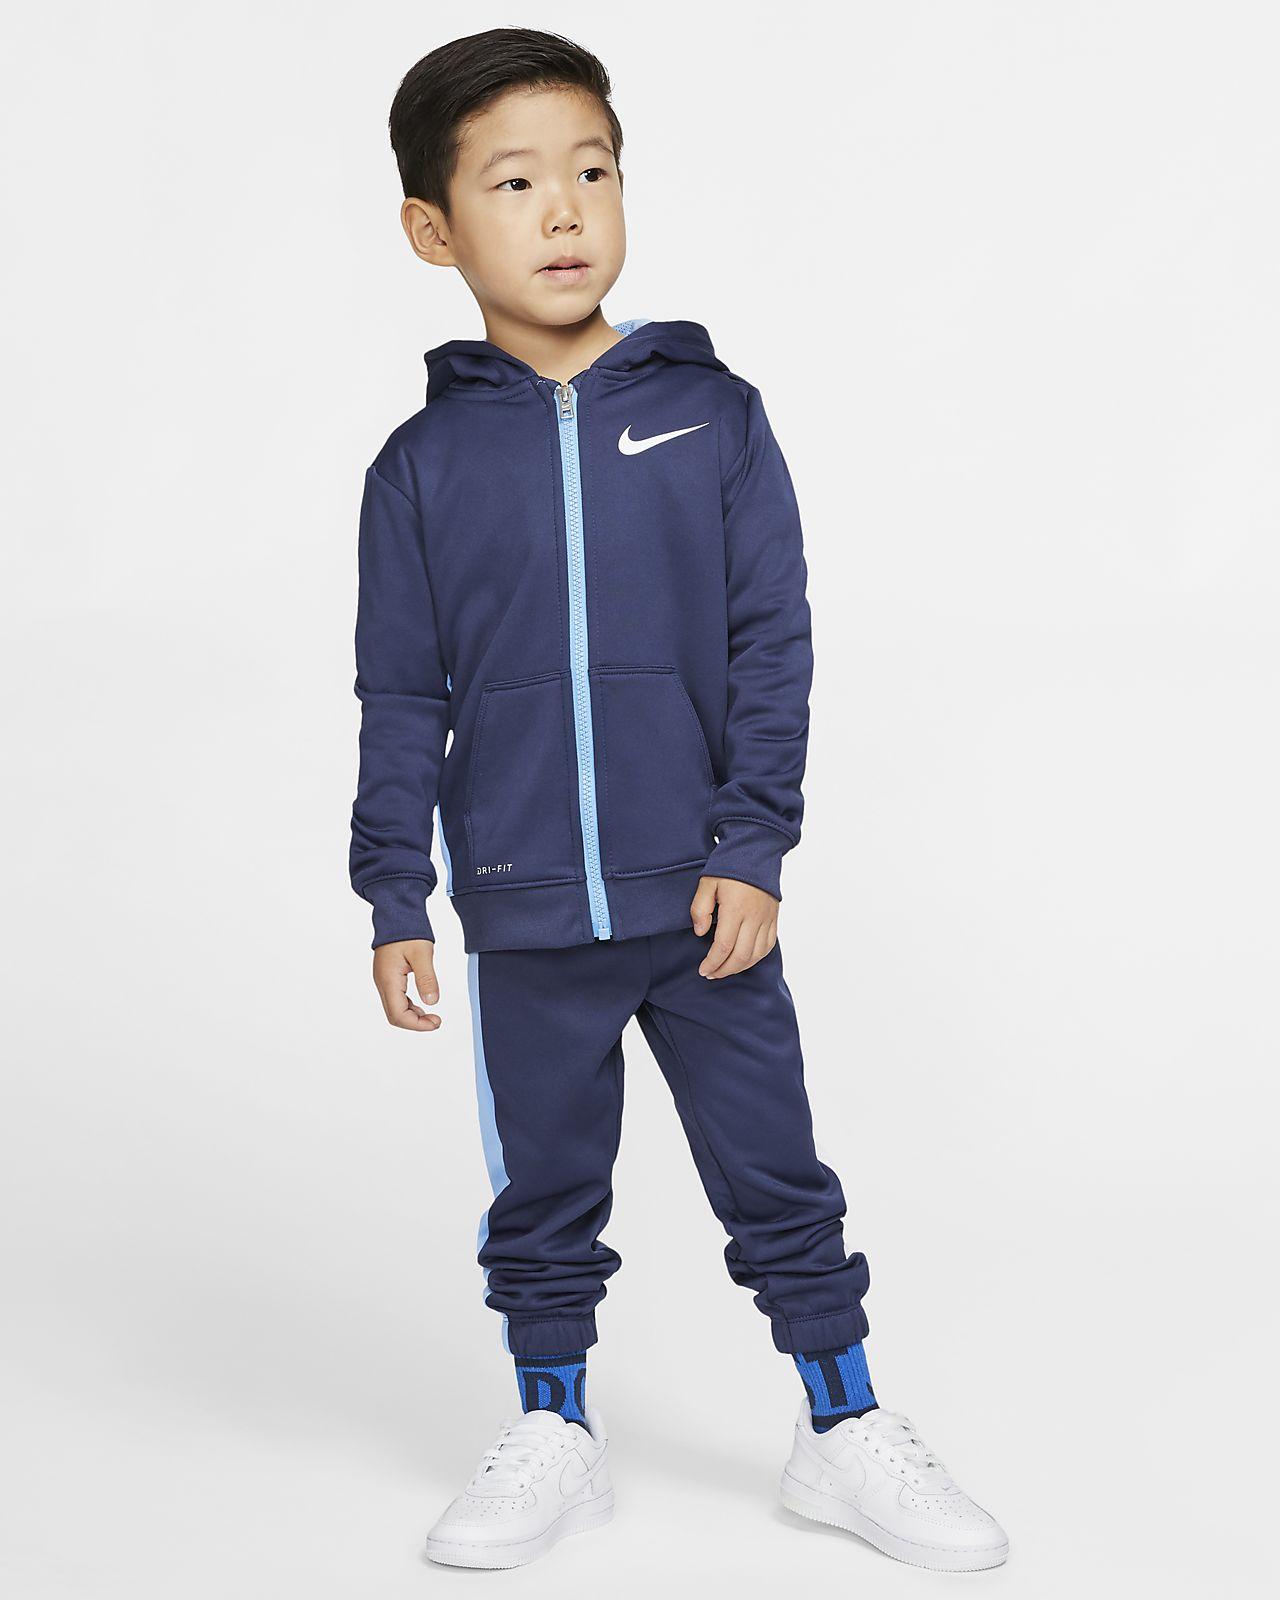 Nike Therma Toddler Hoodie and Pants Set